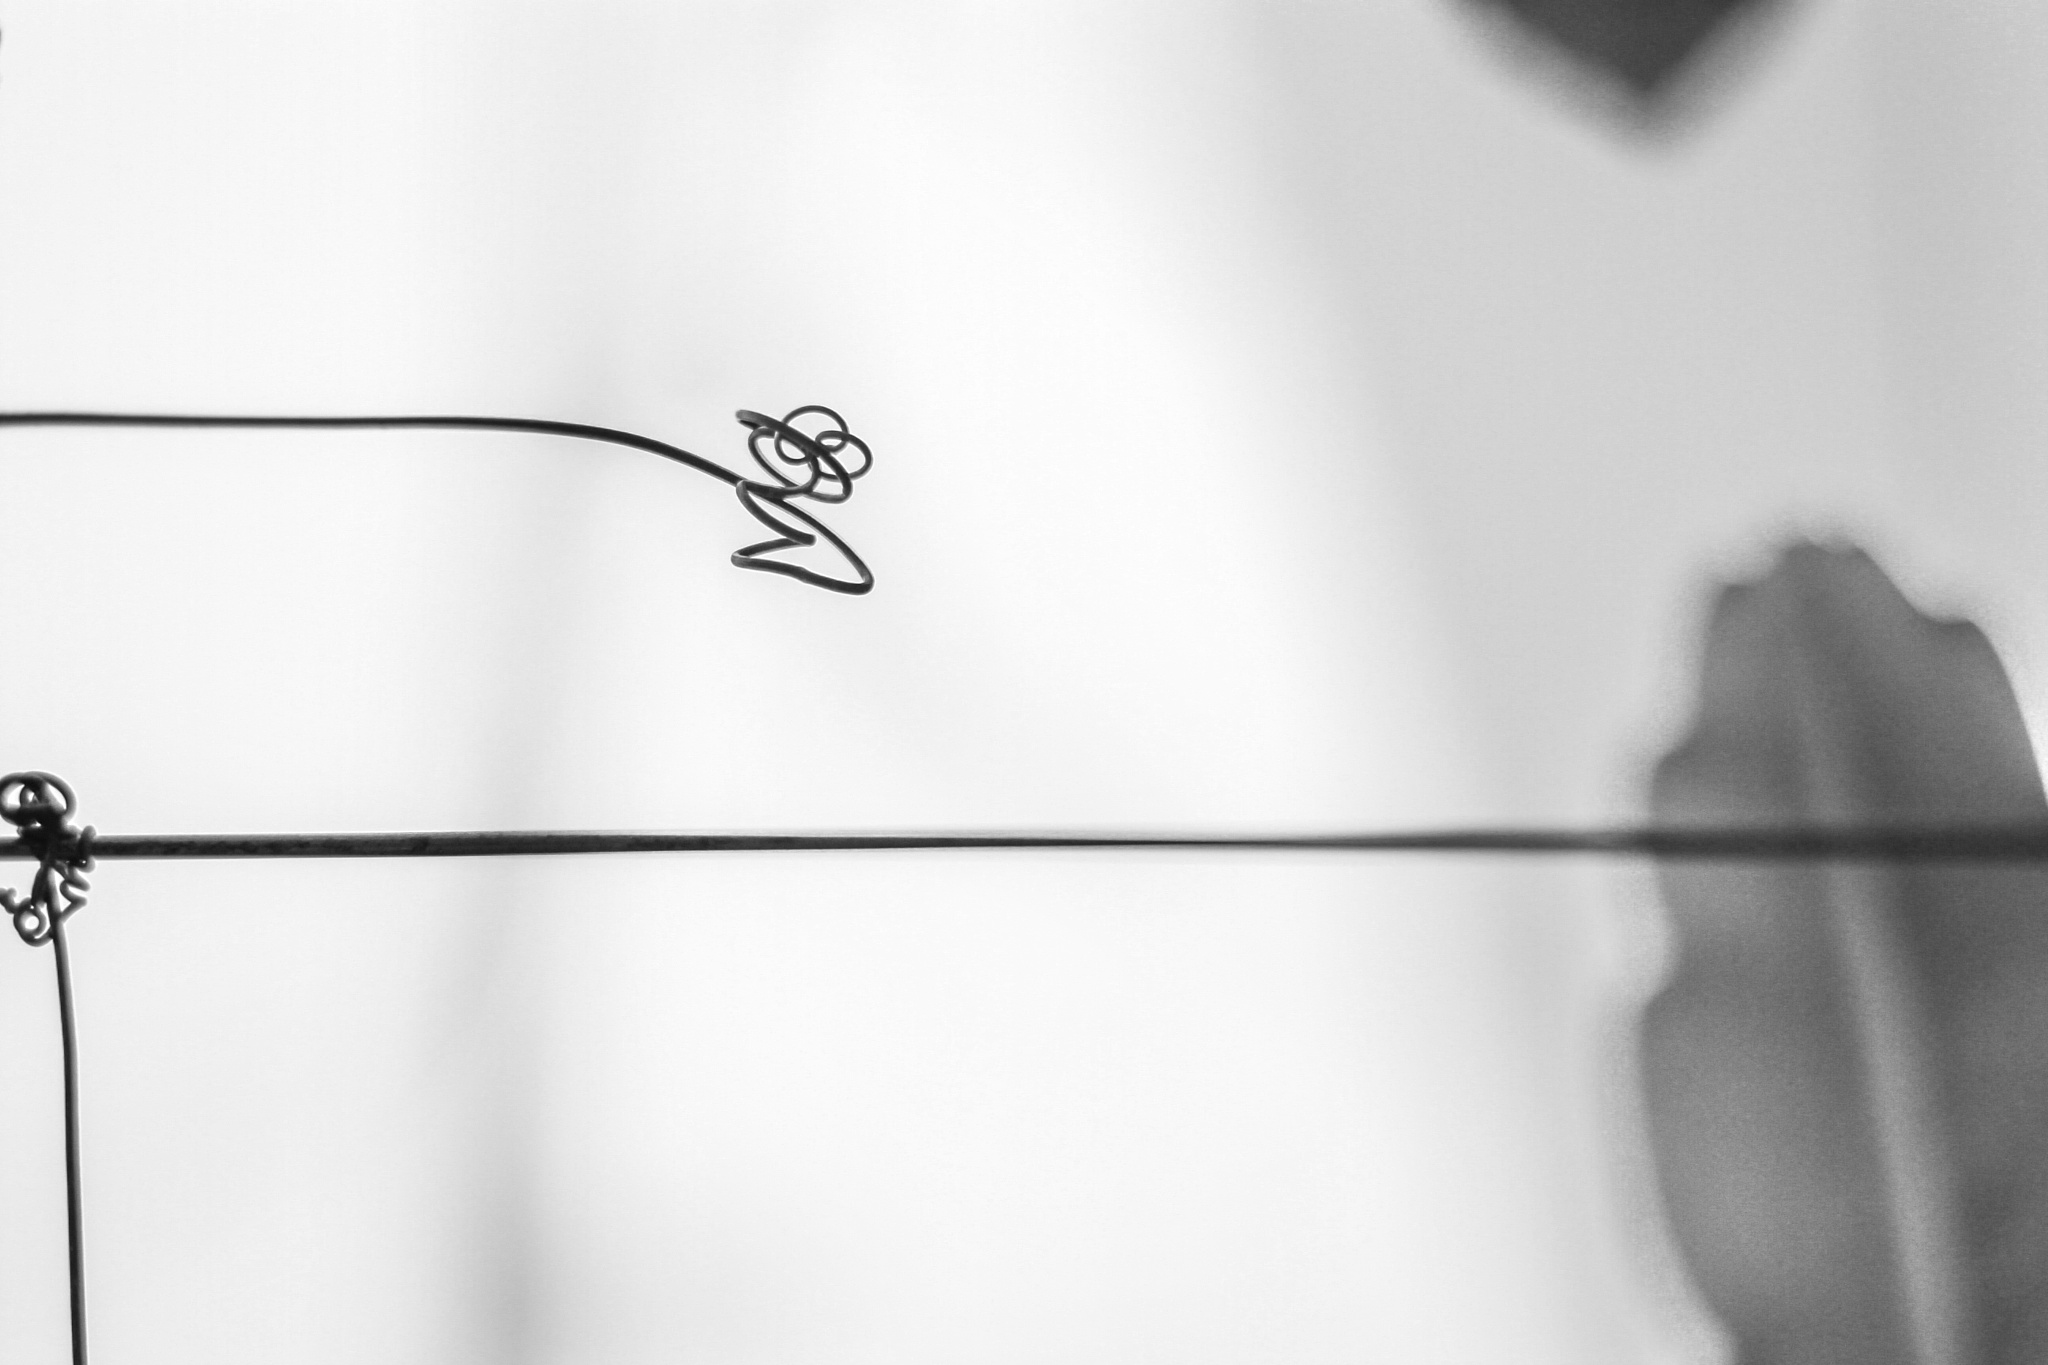 Flat line and confusion by Syafri Gamal